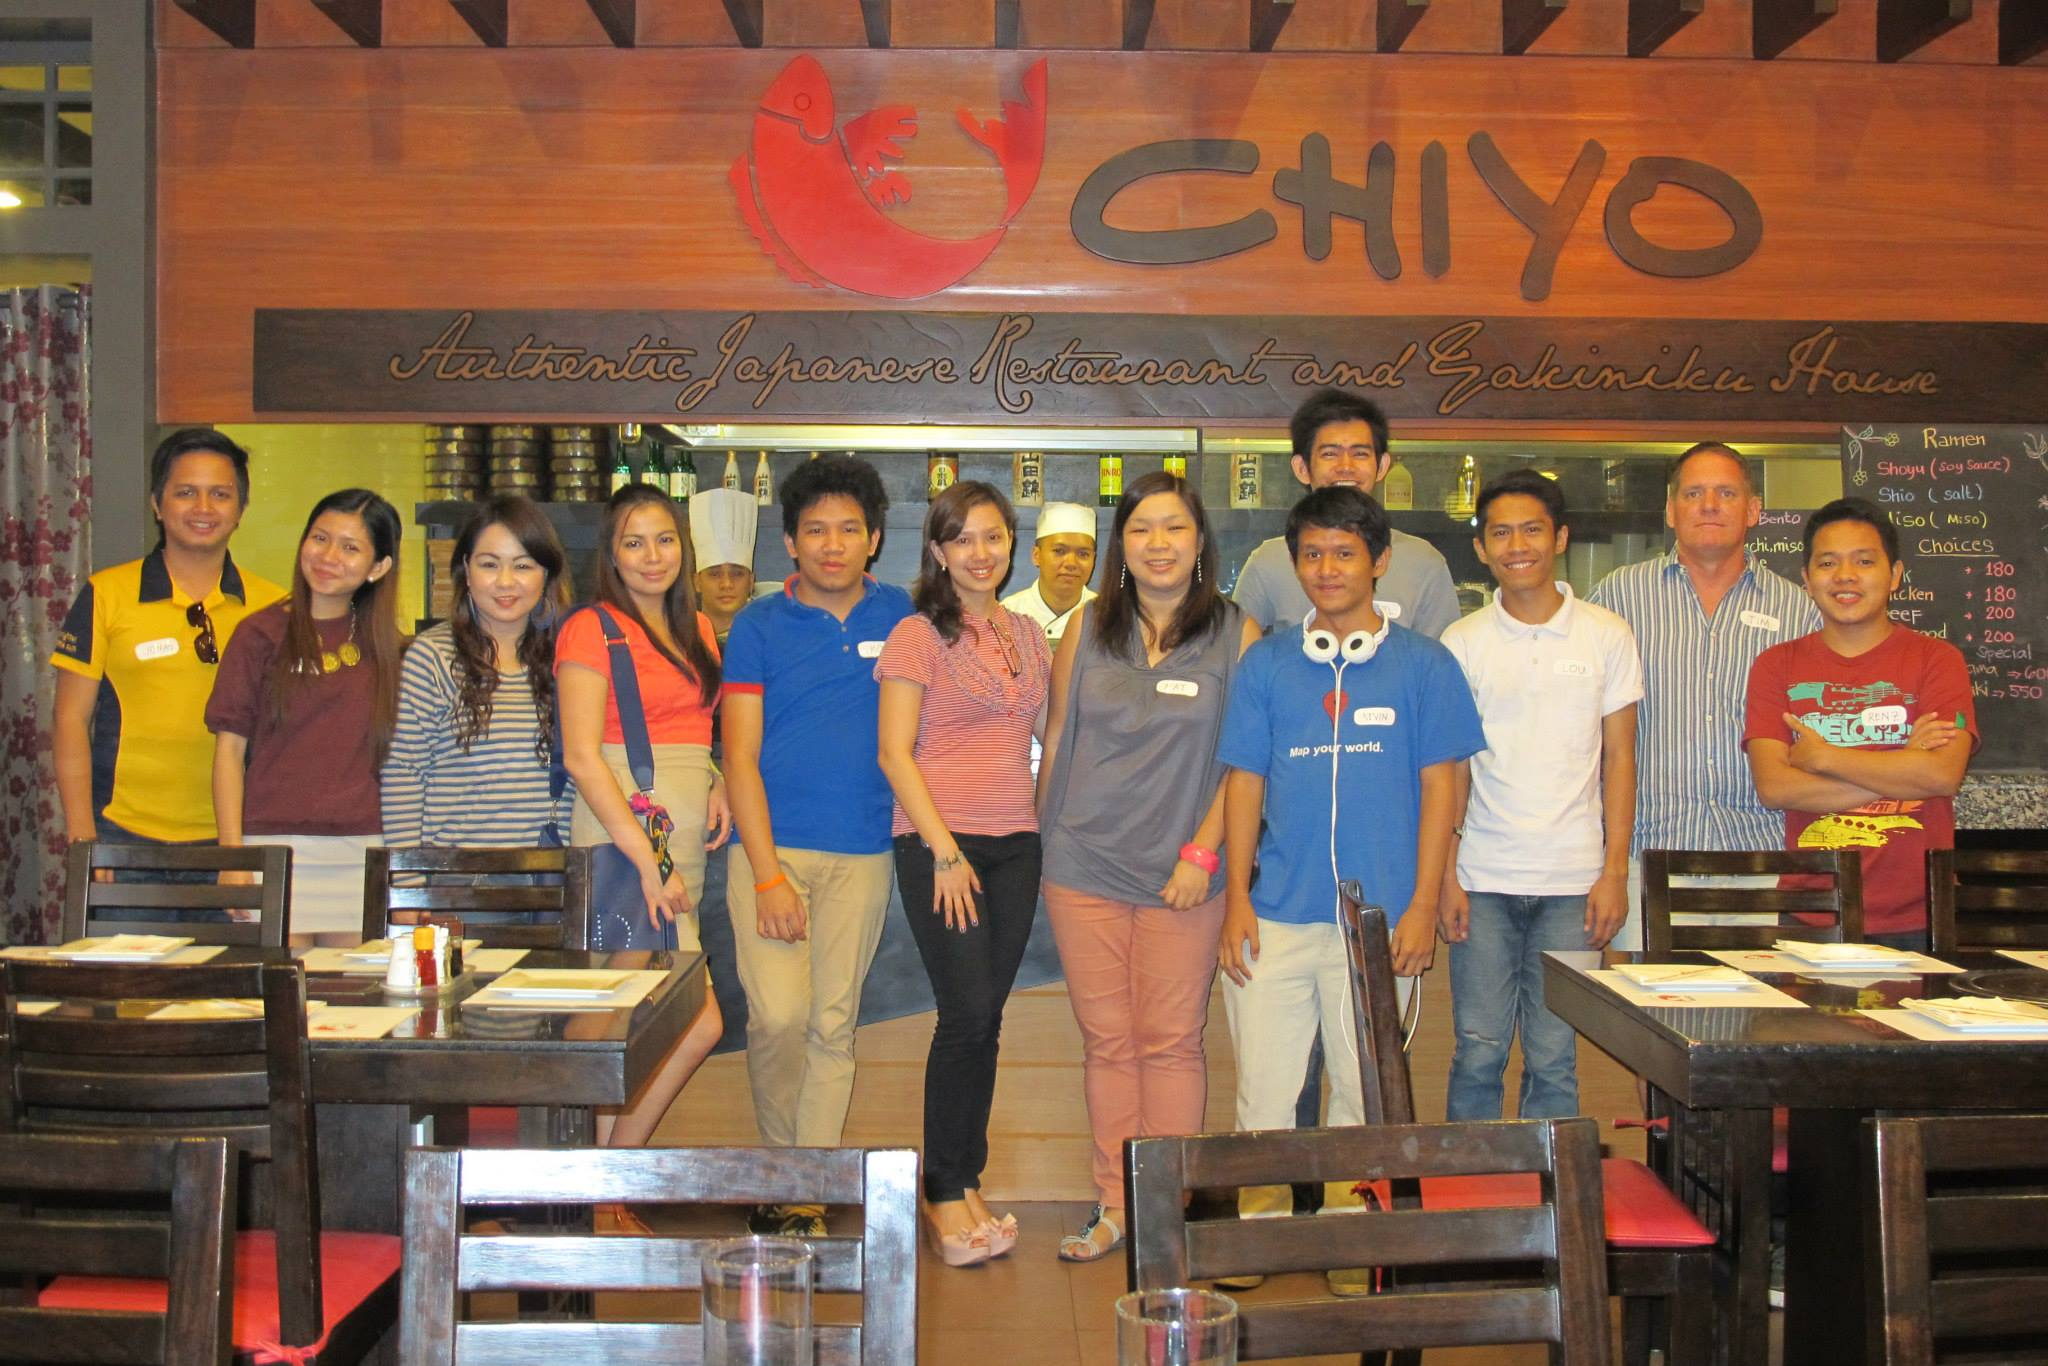 davao event coordinator - chiyo PR